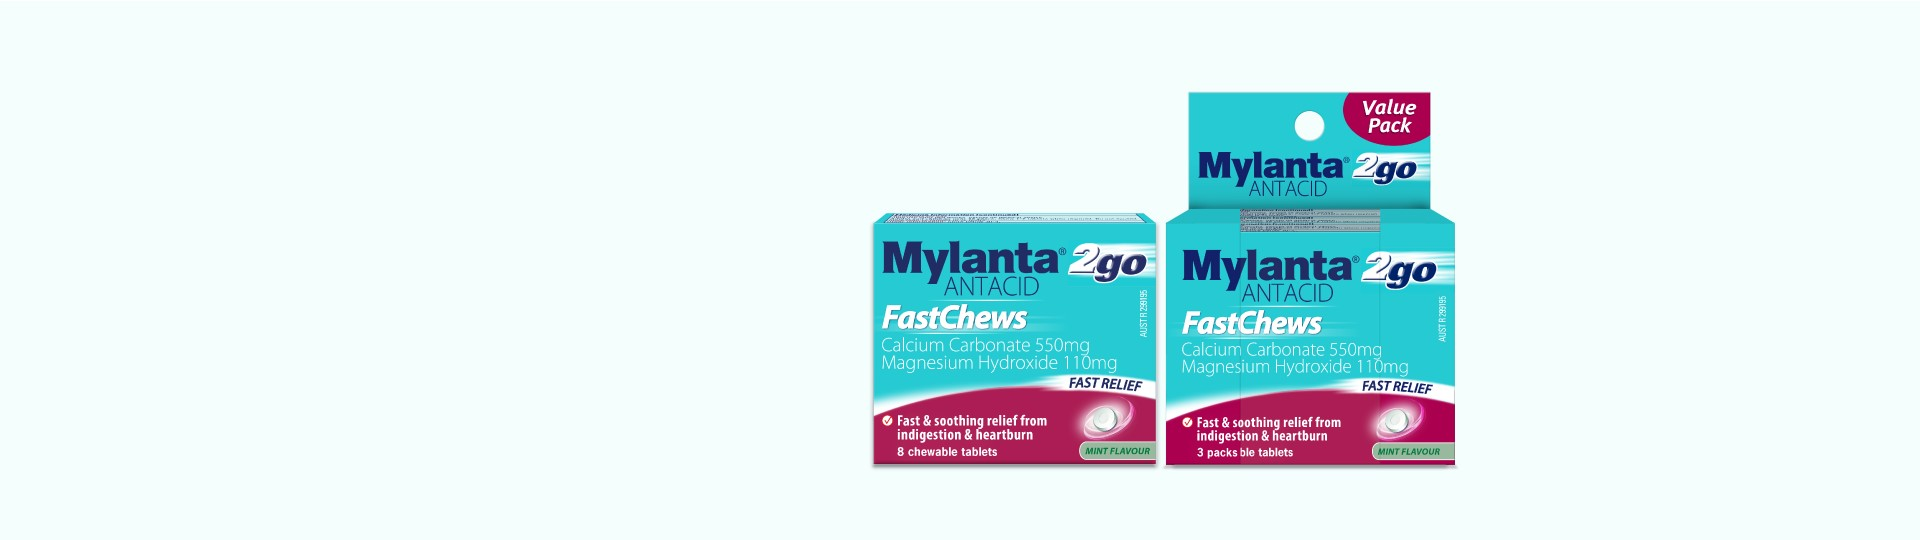 mylanta-fastchews-slide-image-desktop.jpg